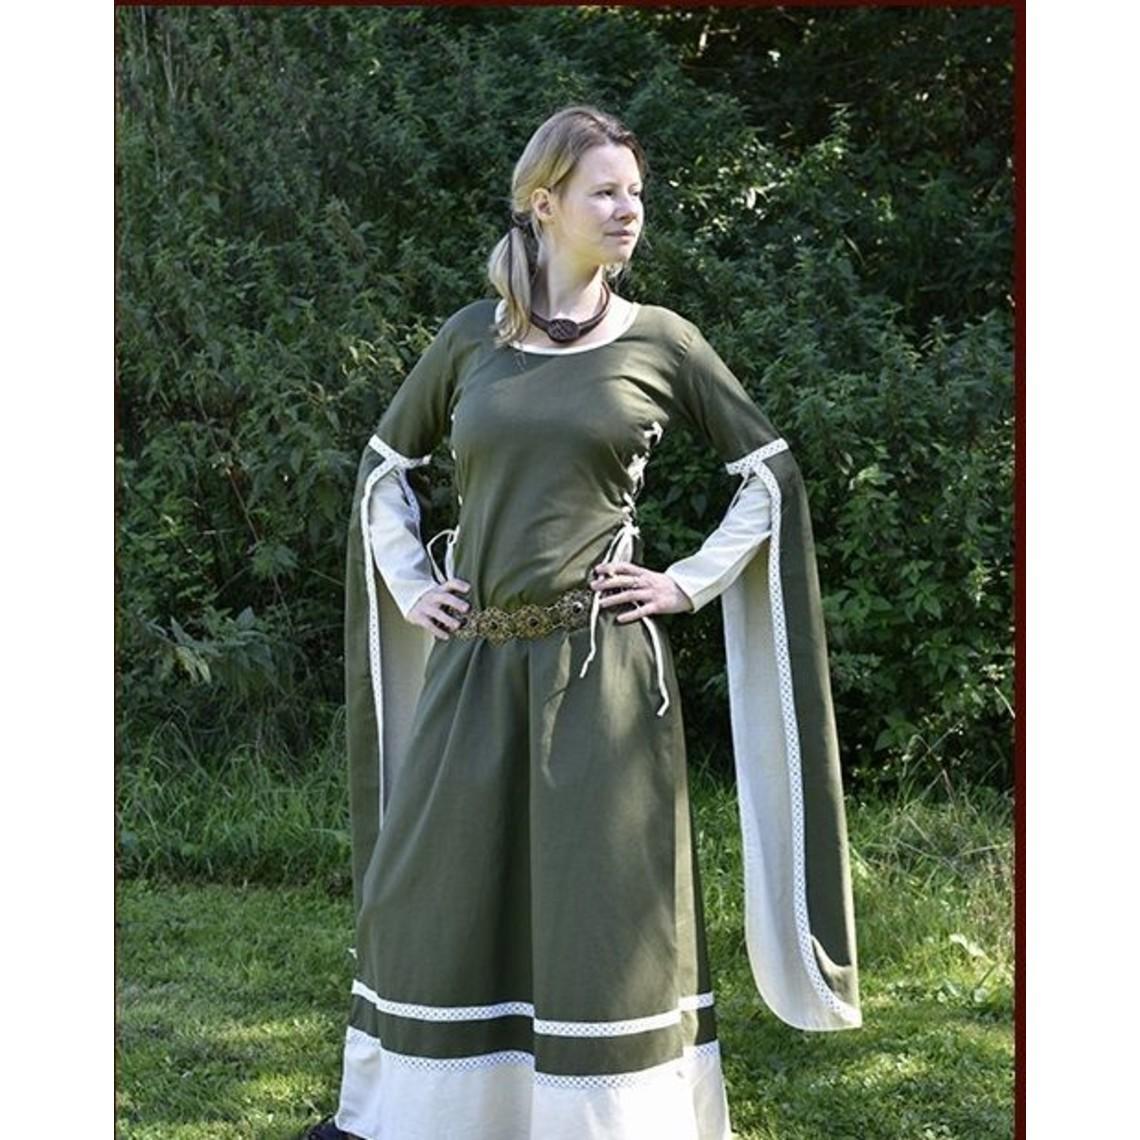 Robe médiévale Dorothee, naturel d'olive